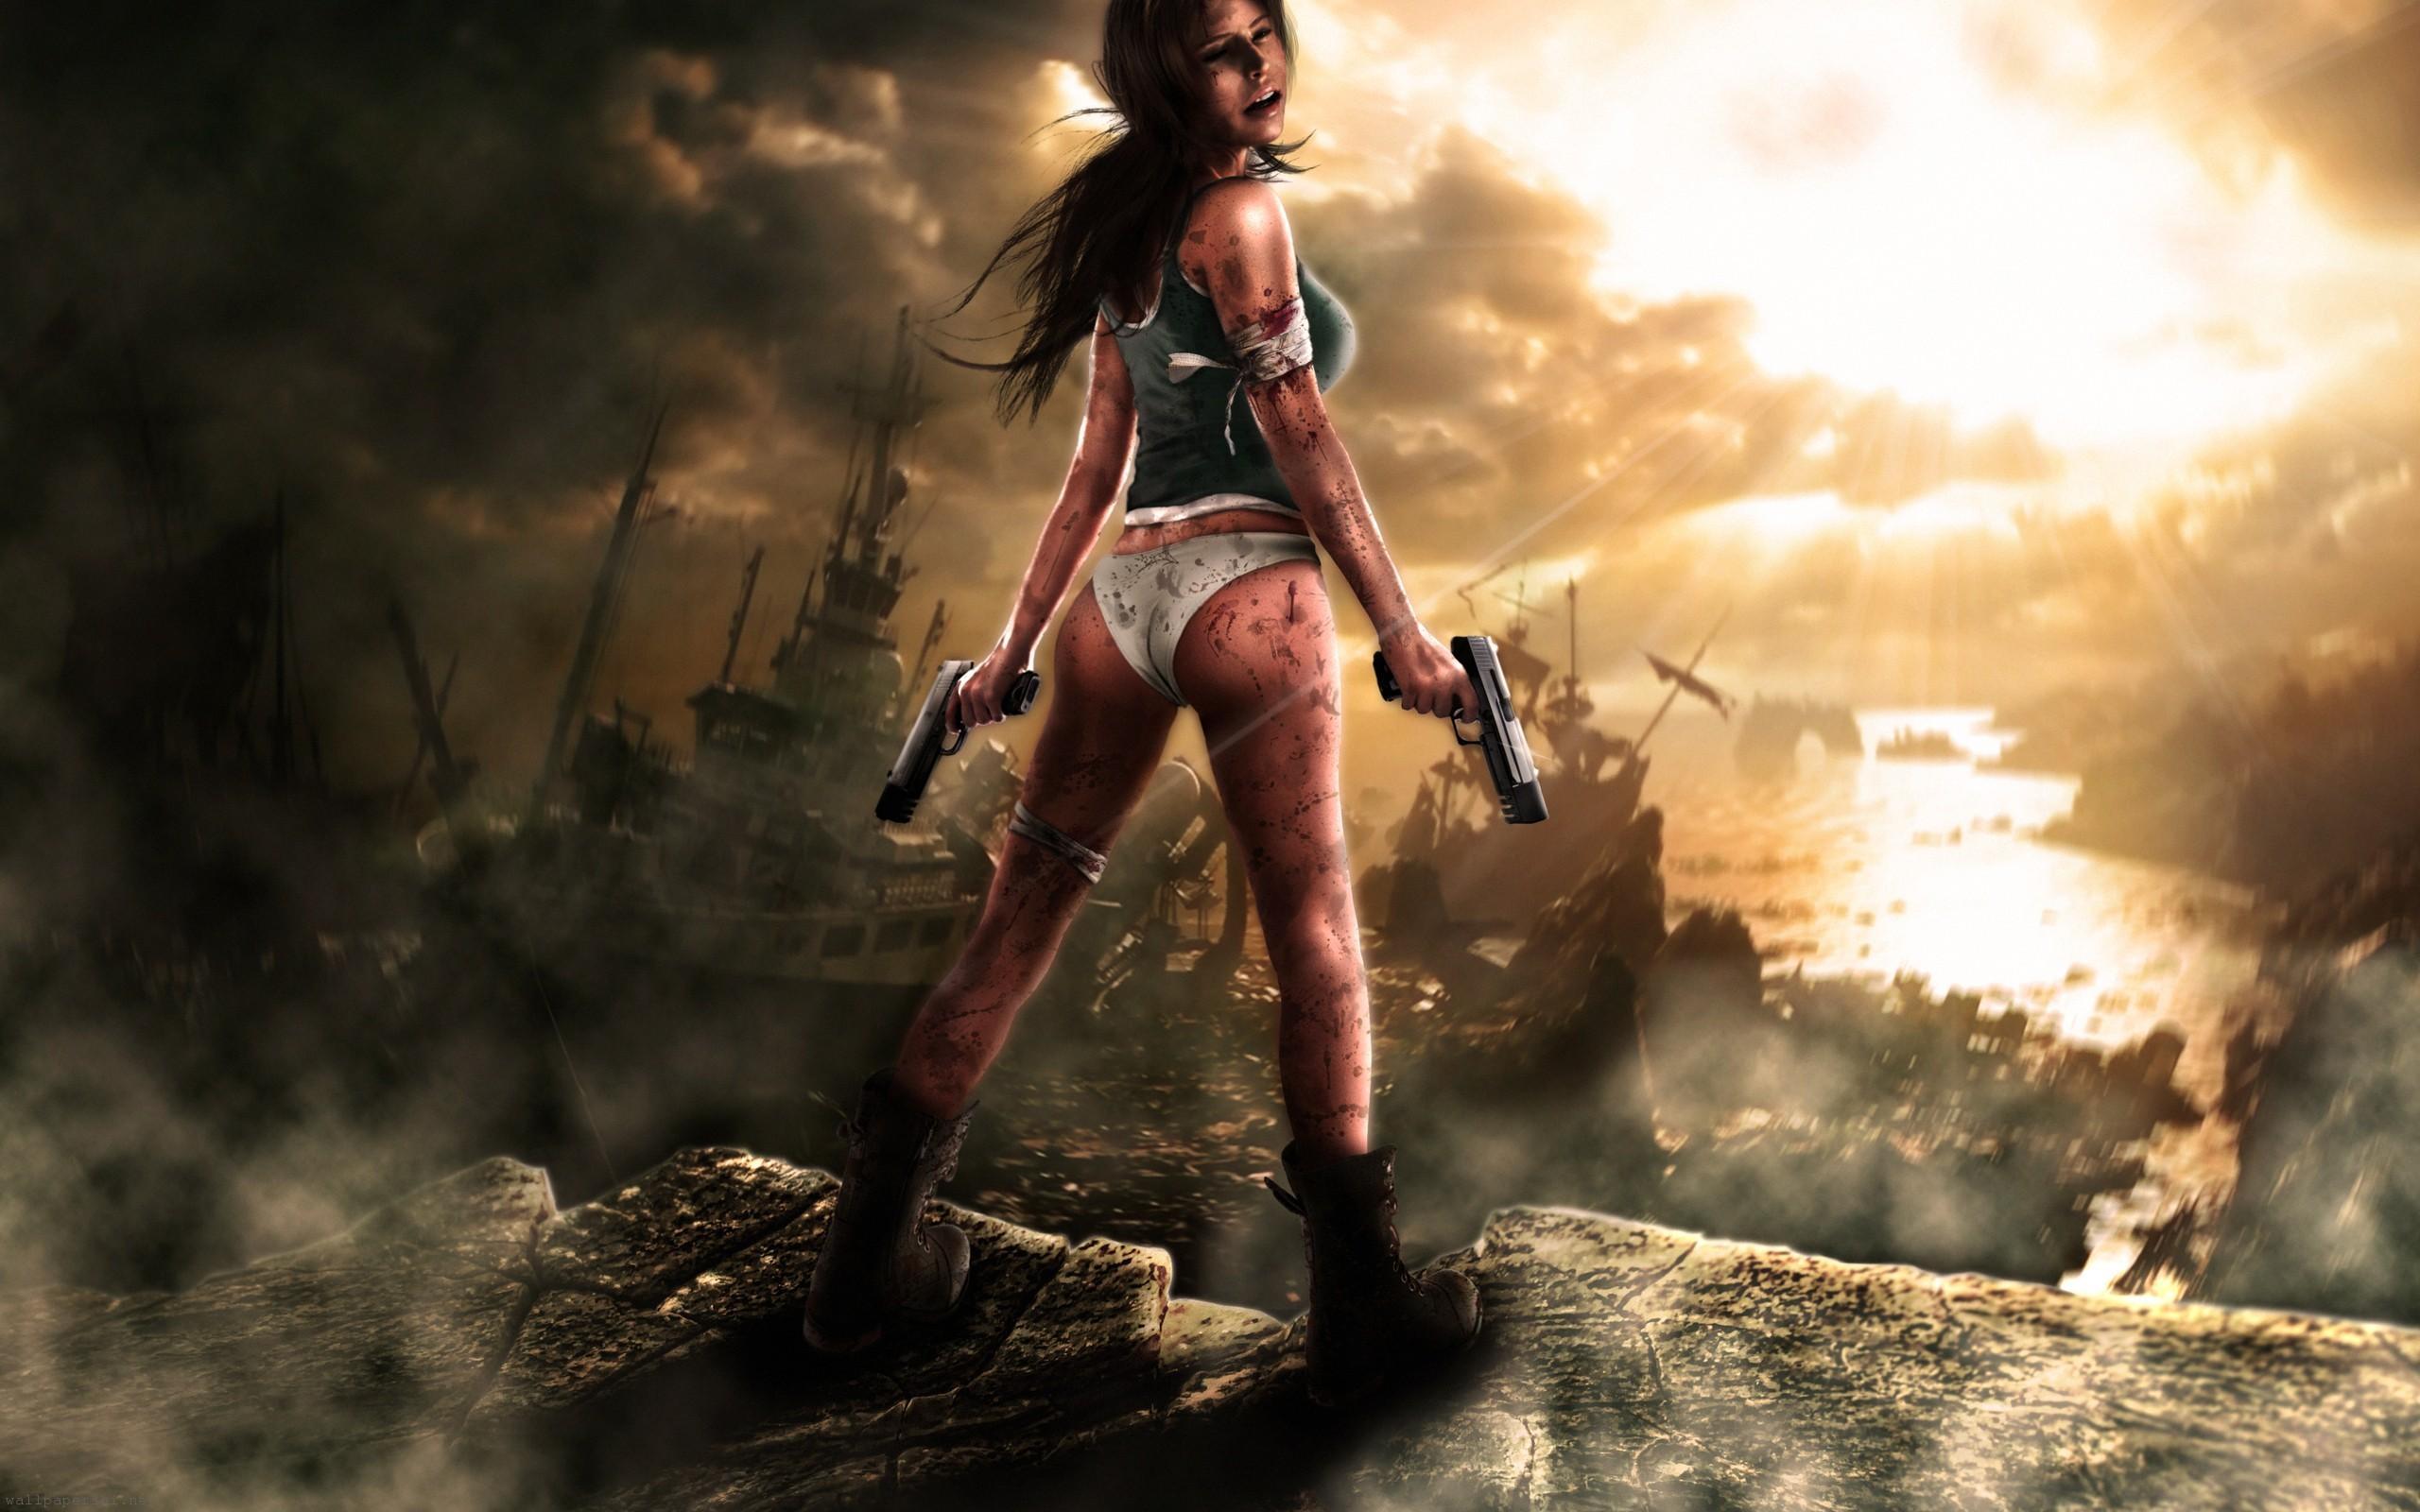 Copia di lara croft girl gun full hd